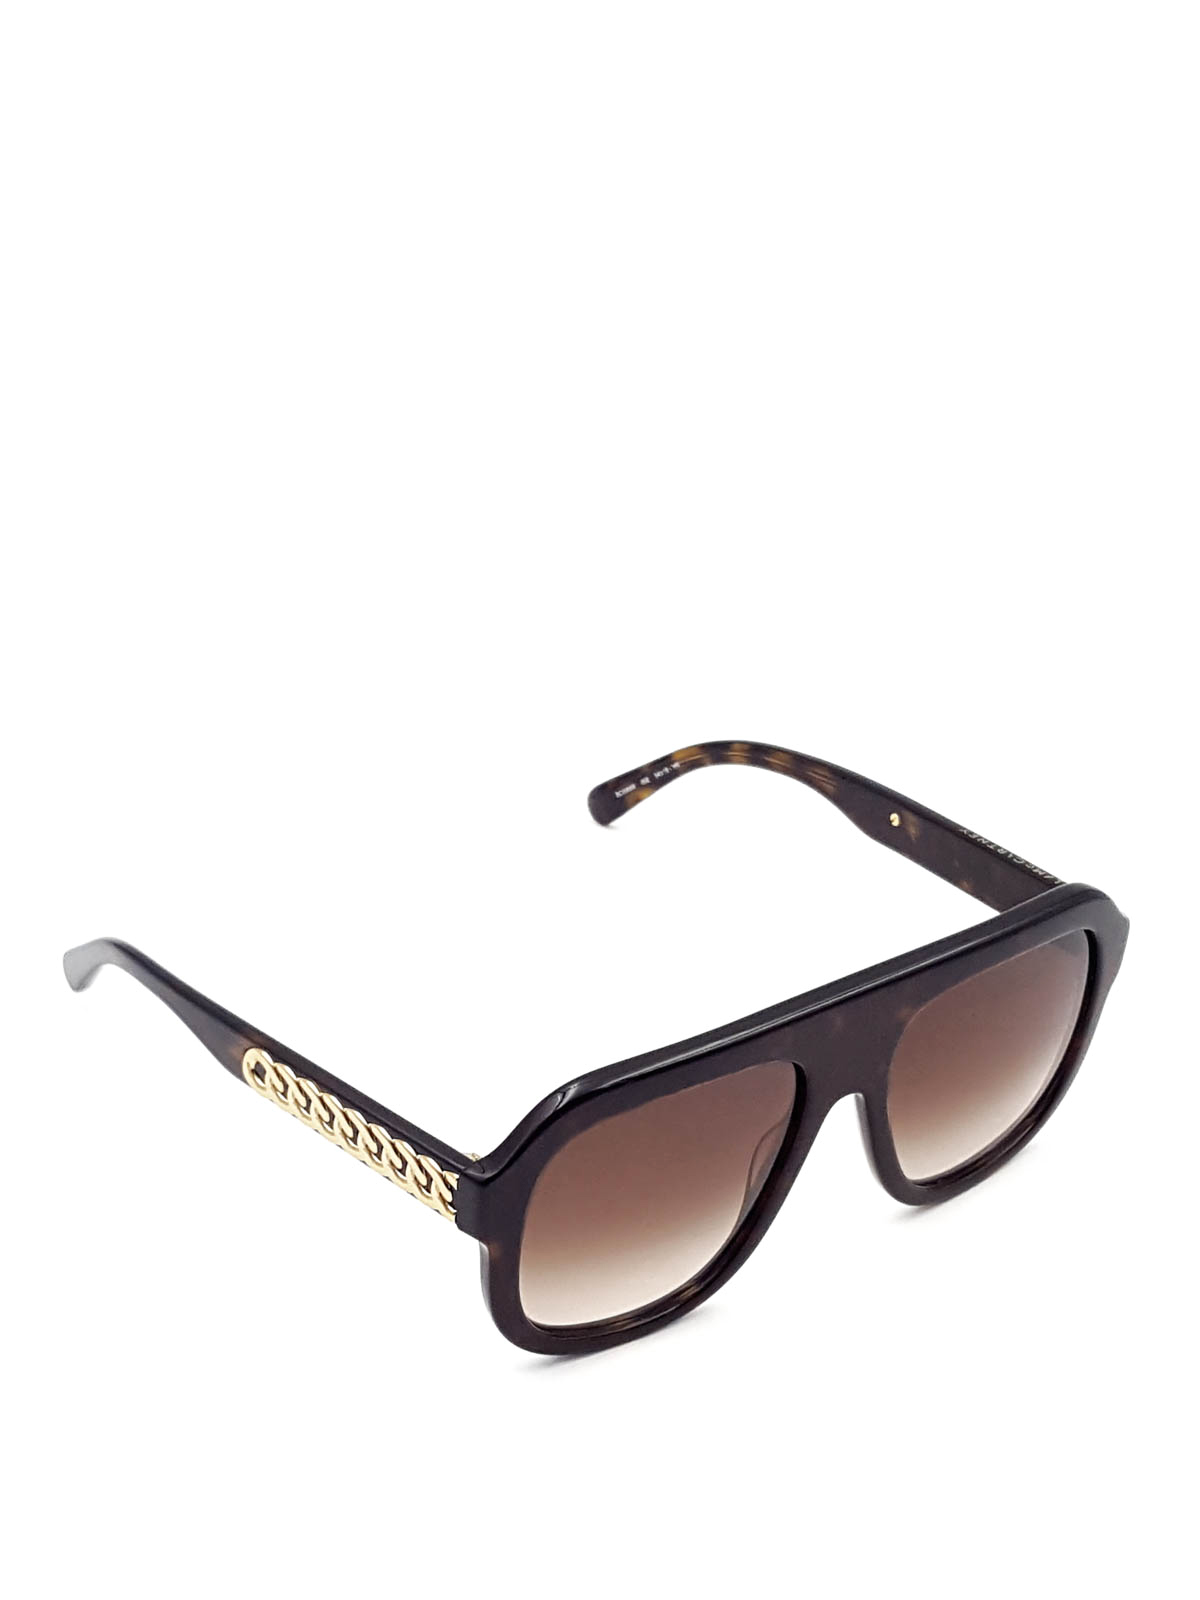 f82789a8c5a32 Stella Mccartney - Golden chains sunglasses - sunglasses - SC0065S2